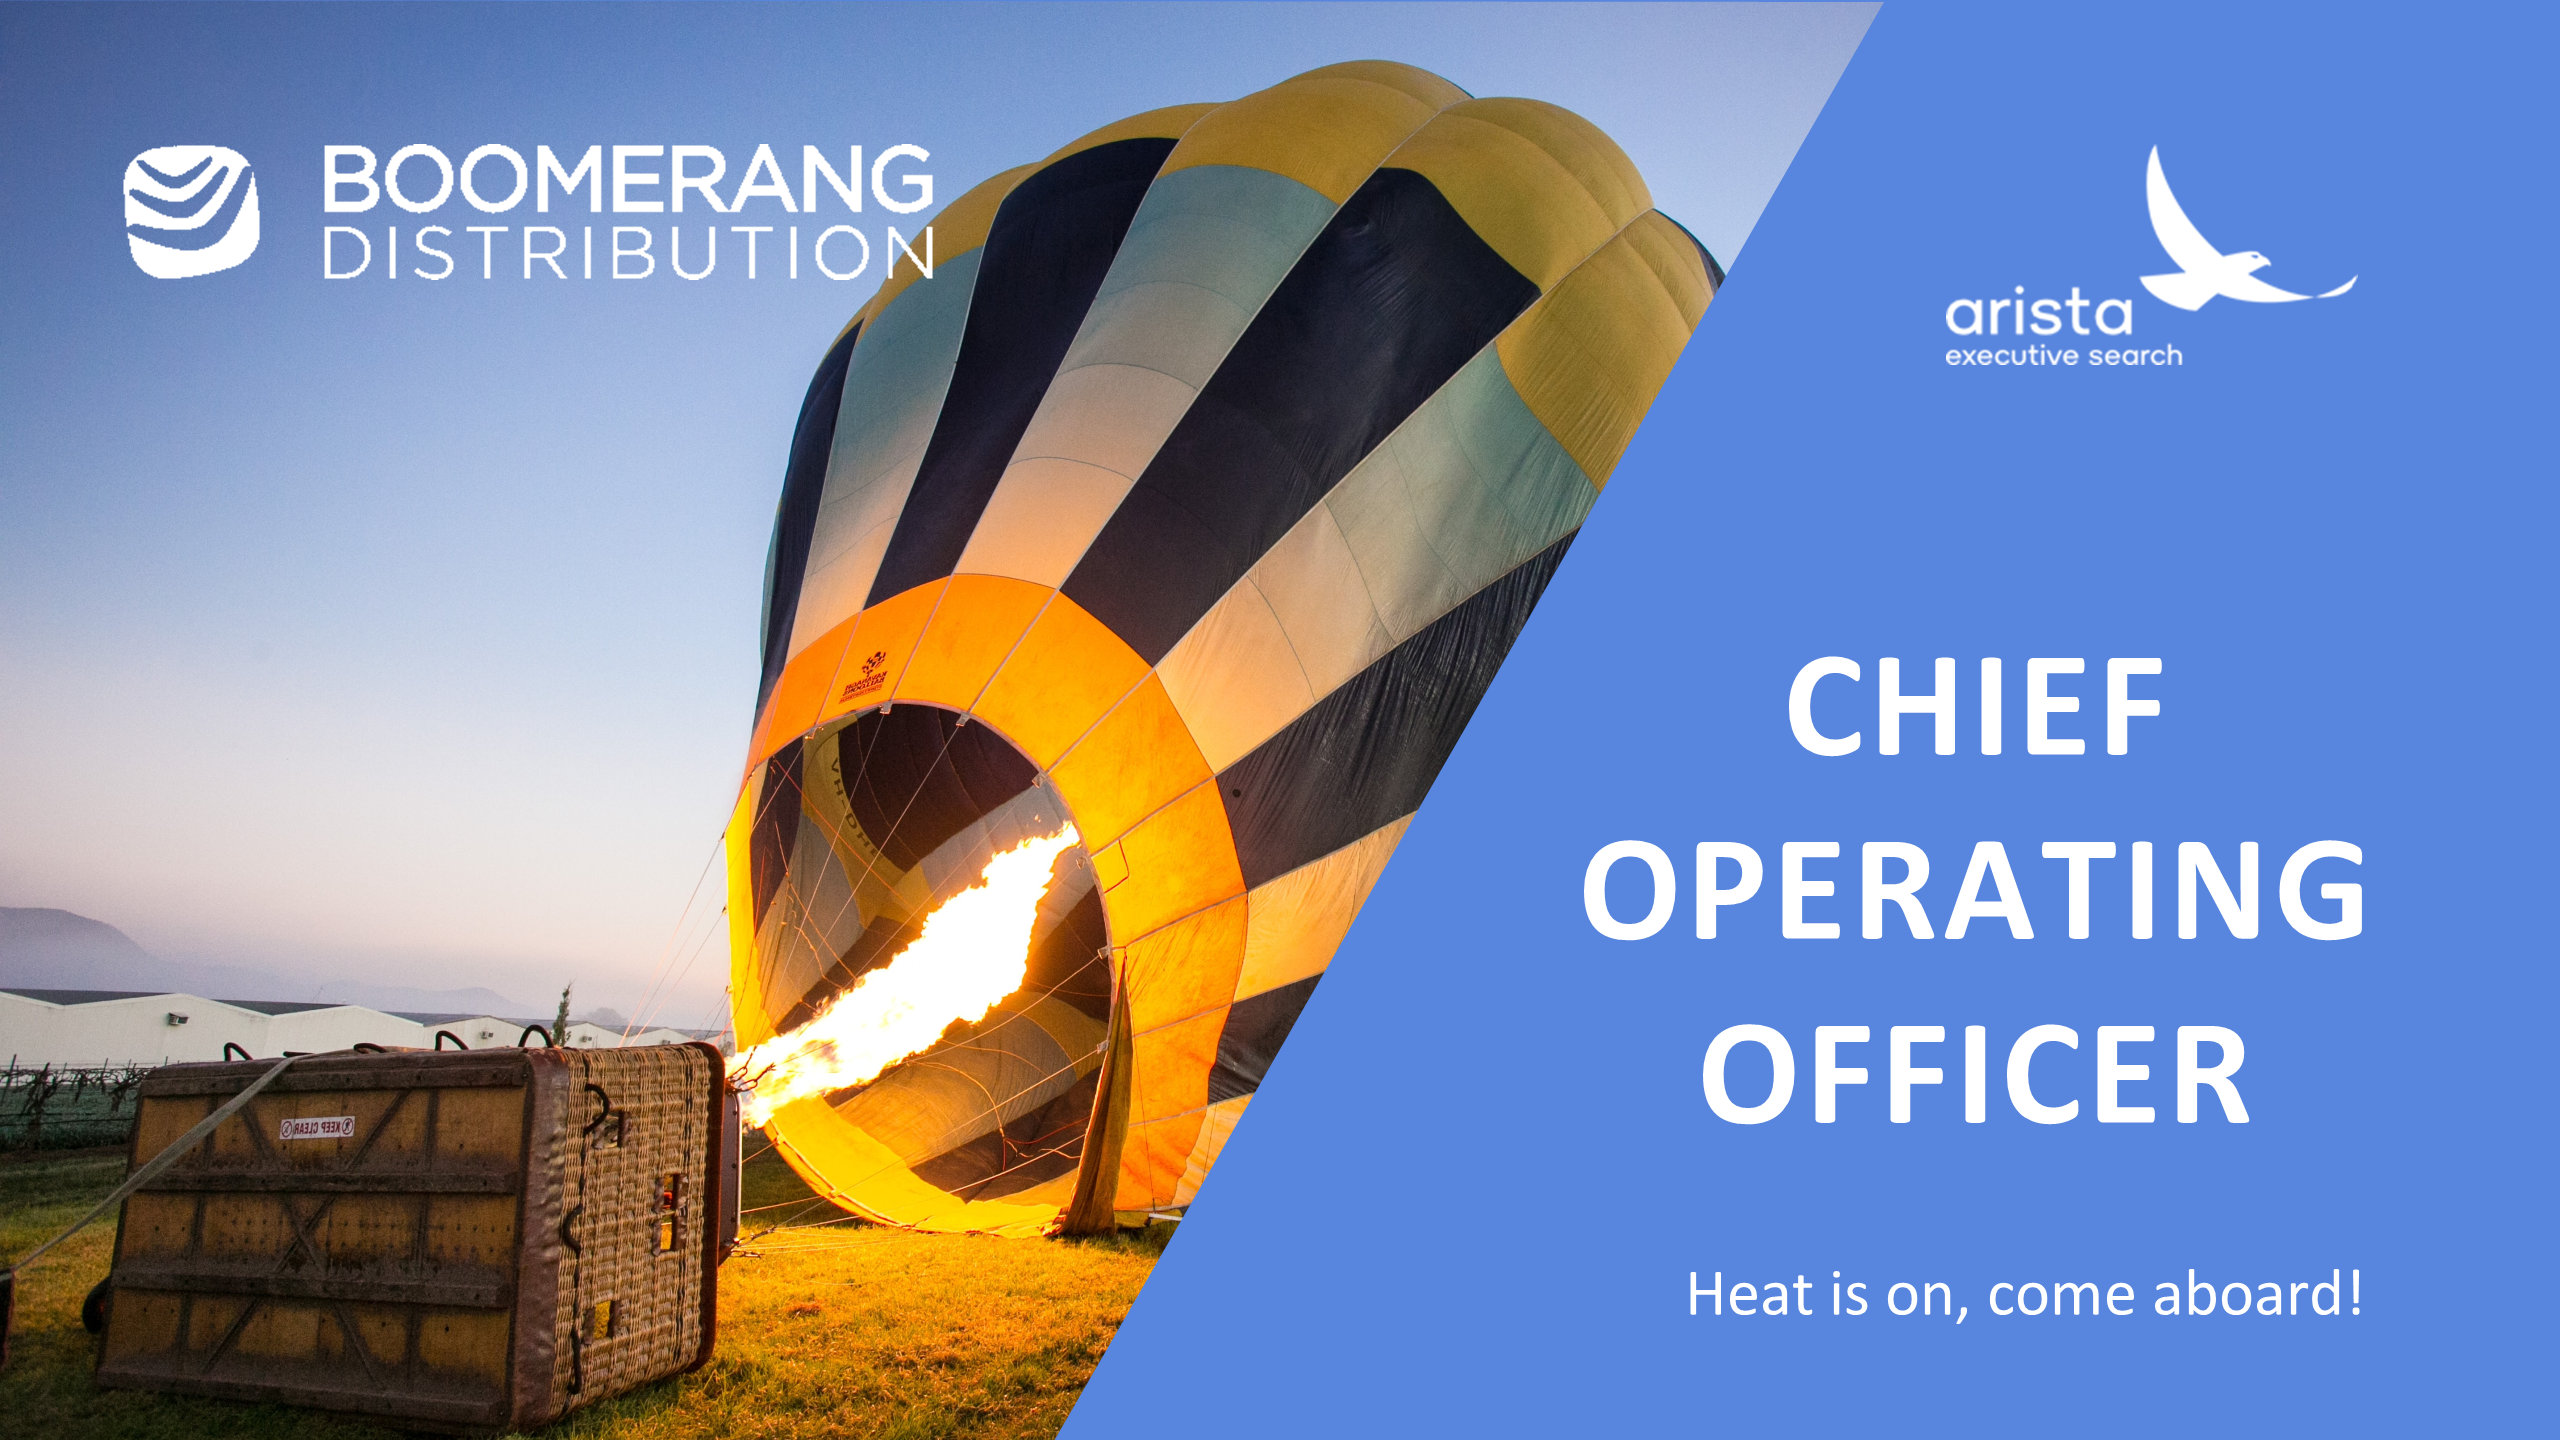 CHIEF OPERATING OFFICER/ OPERATSIOONIDE JUHT